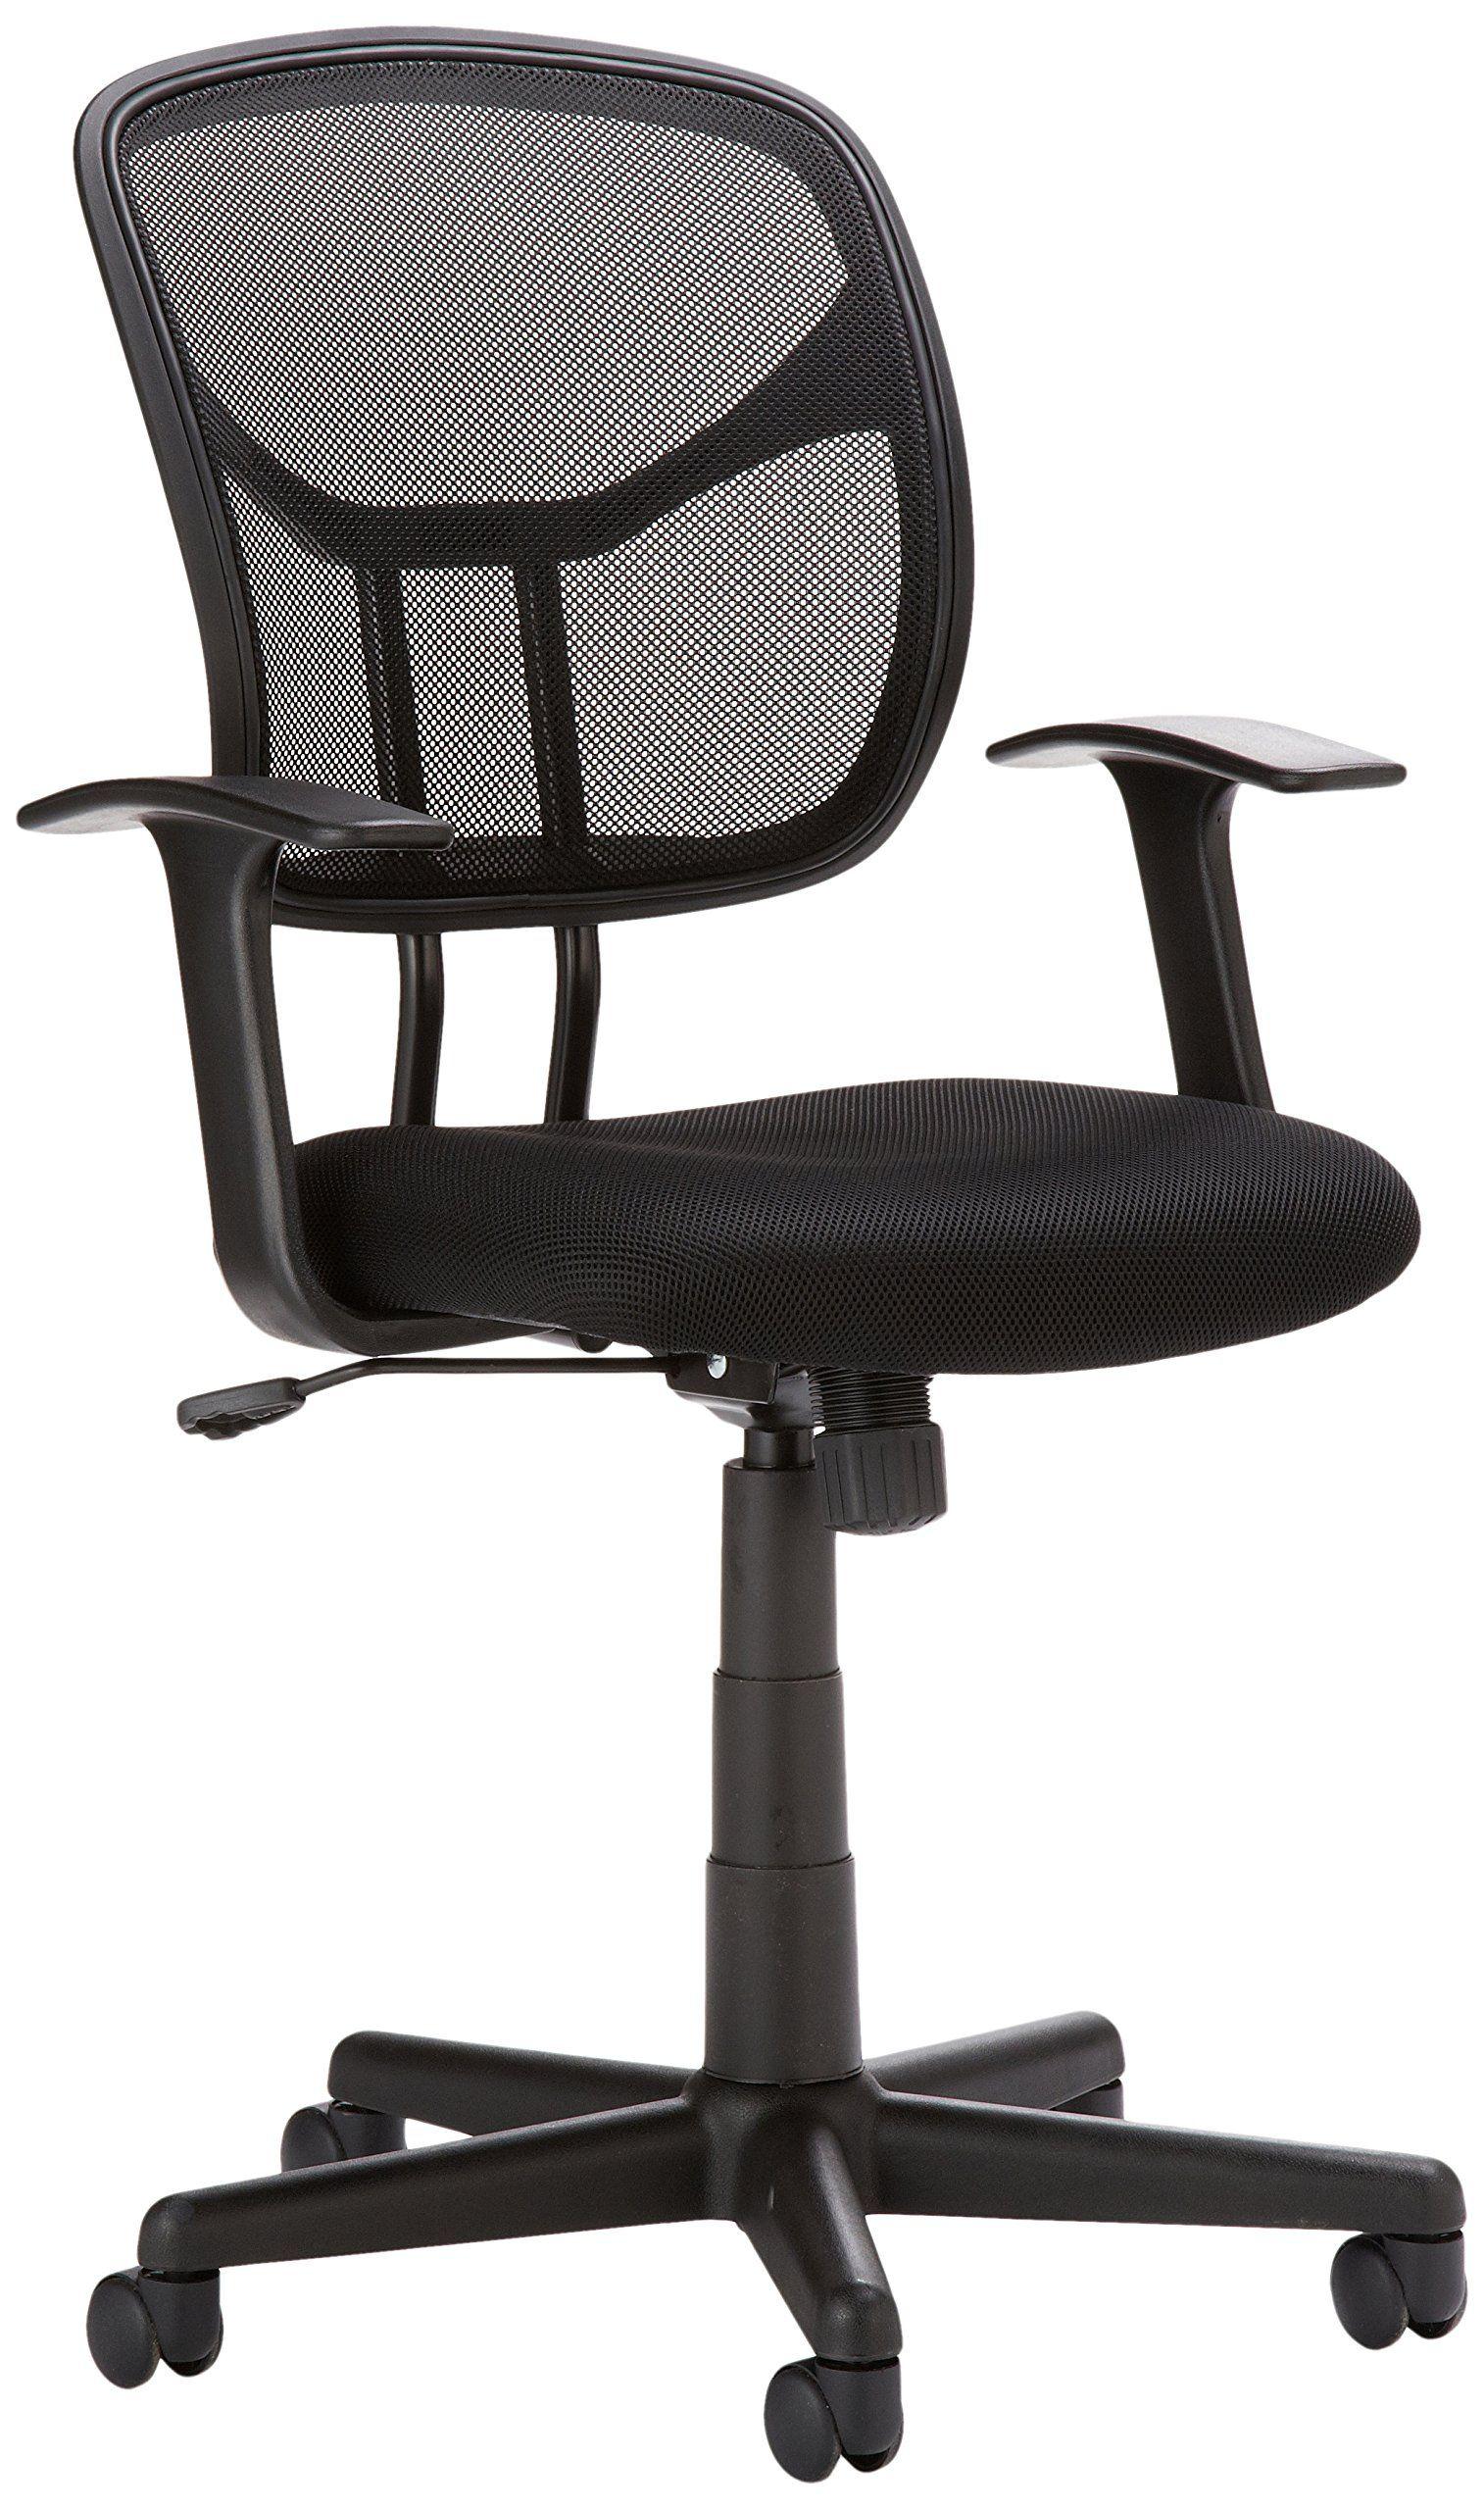 AmazonBasics MidBack Mesh Chair *** See this great product